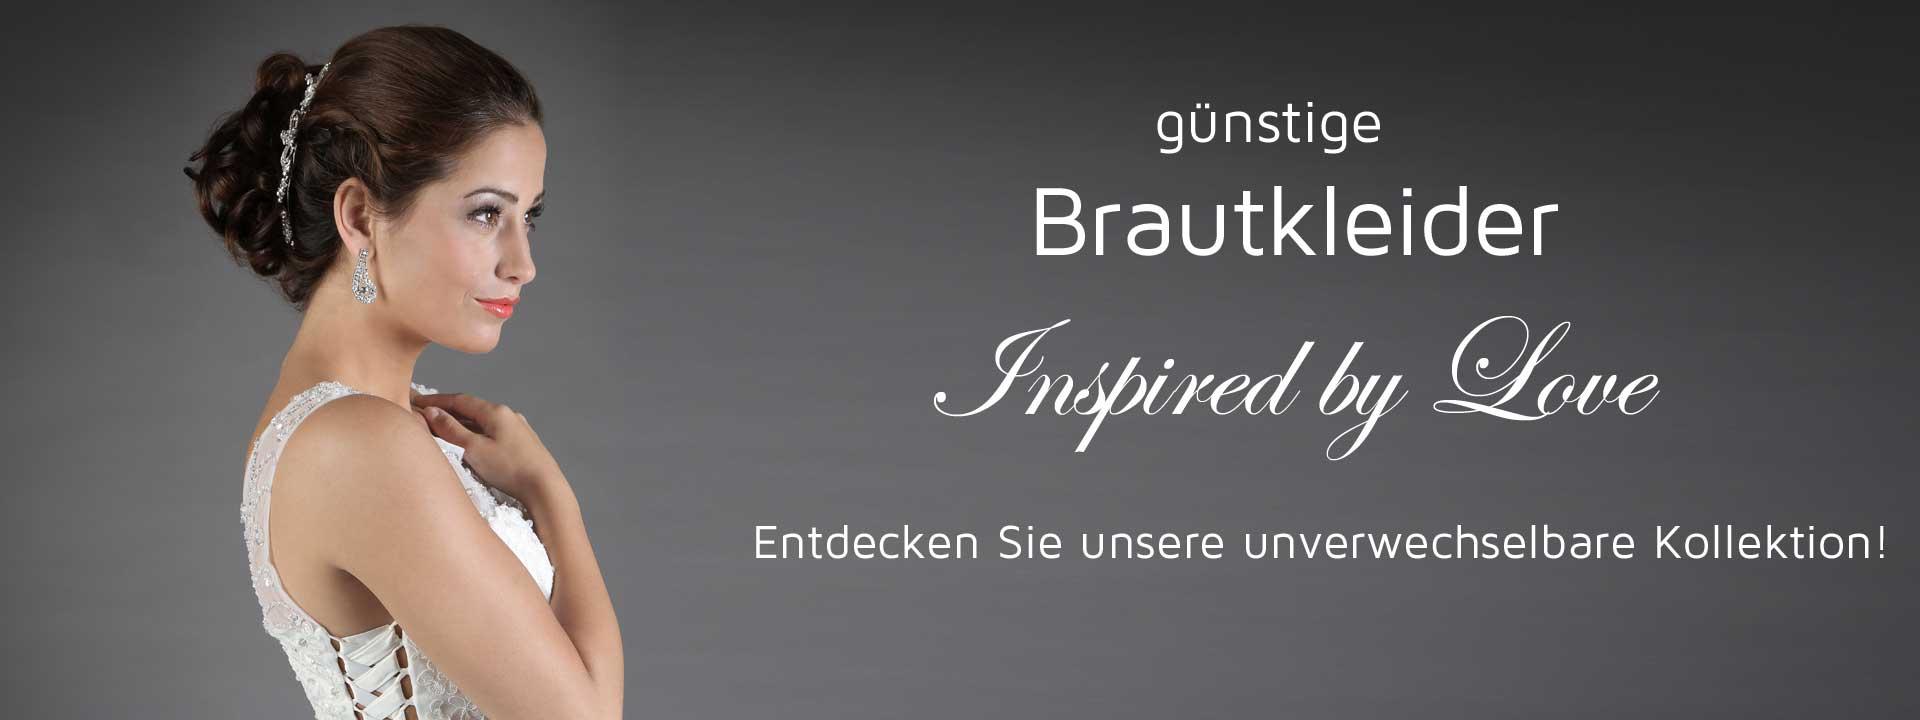 Brautkleiderkollektion 2019